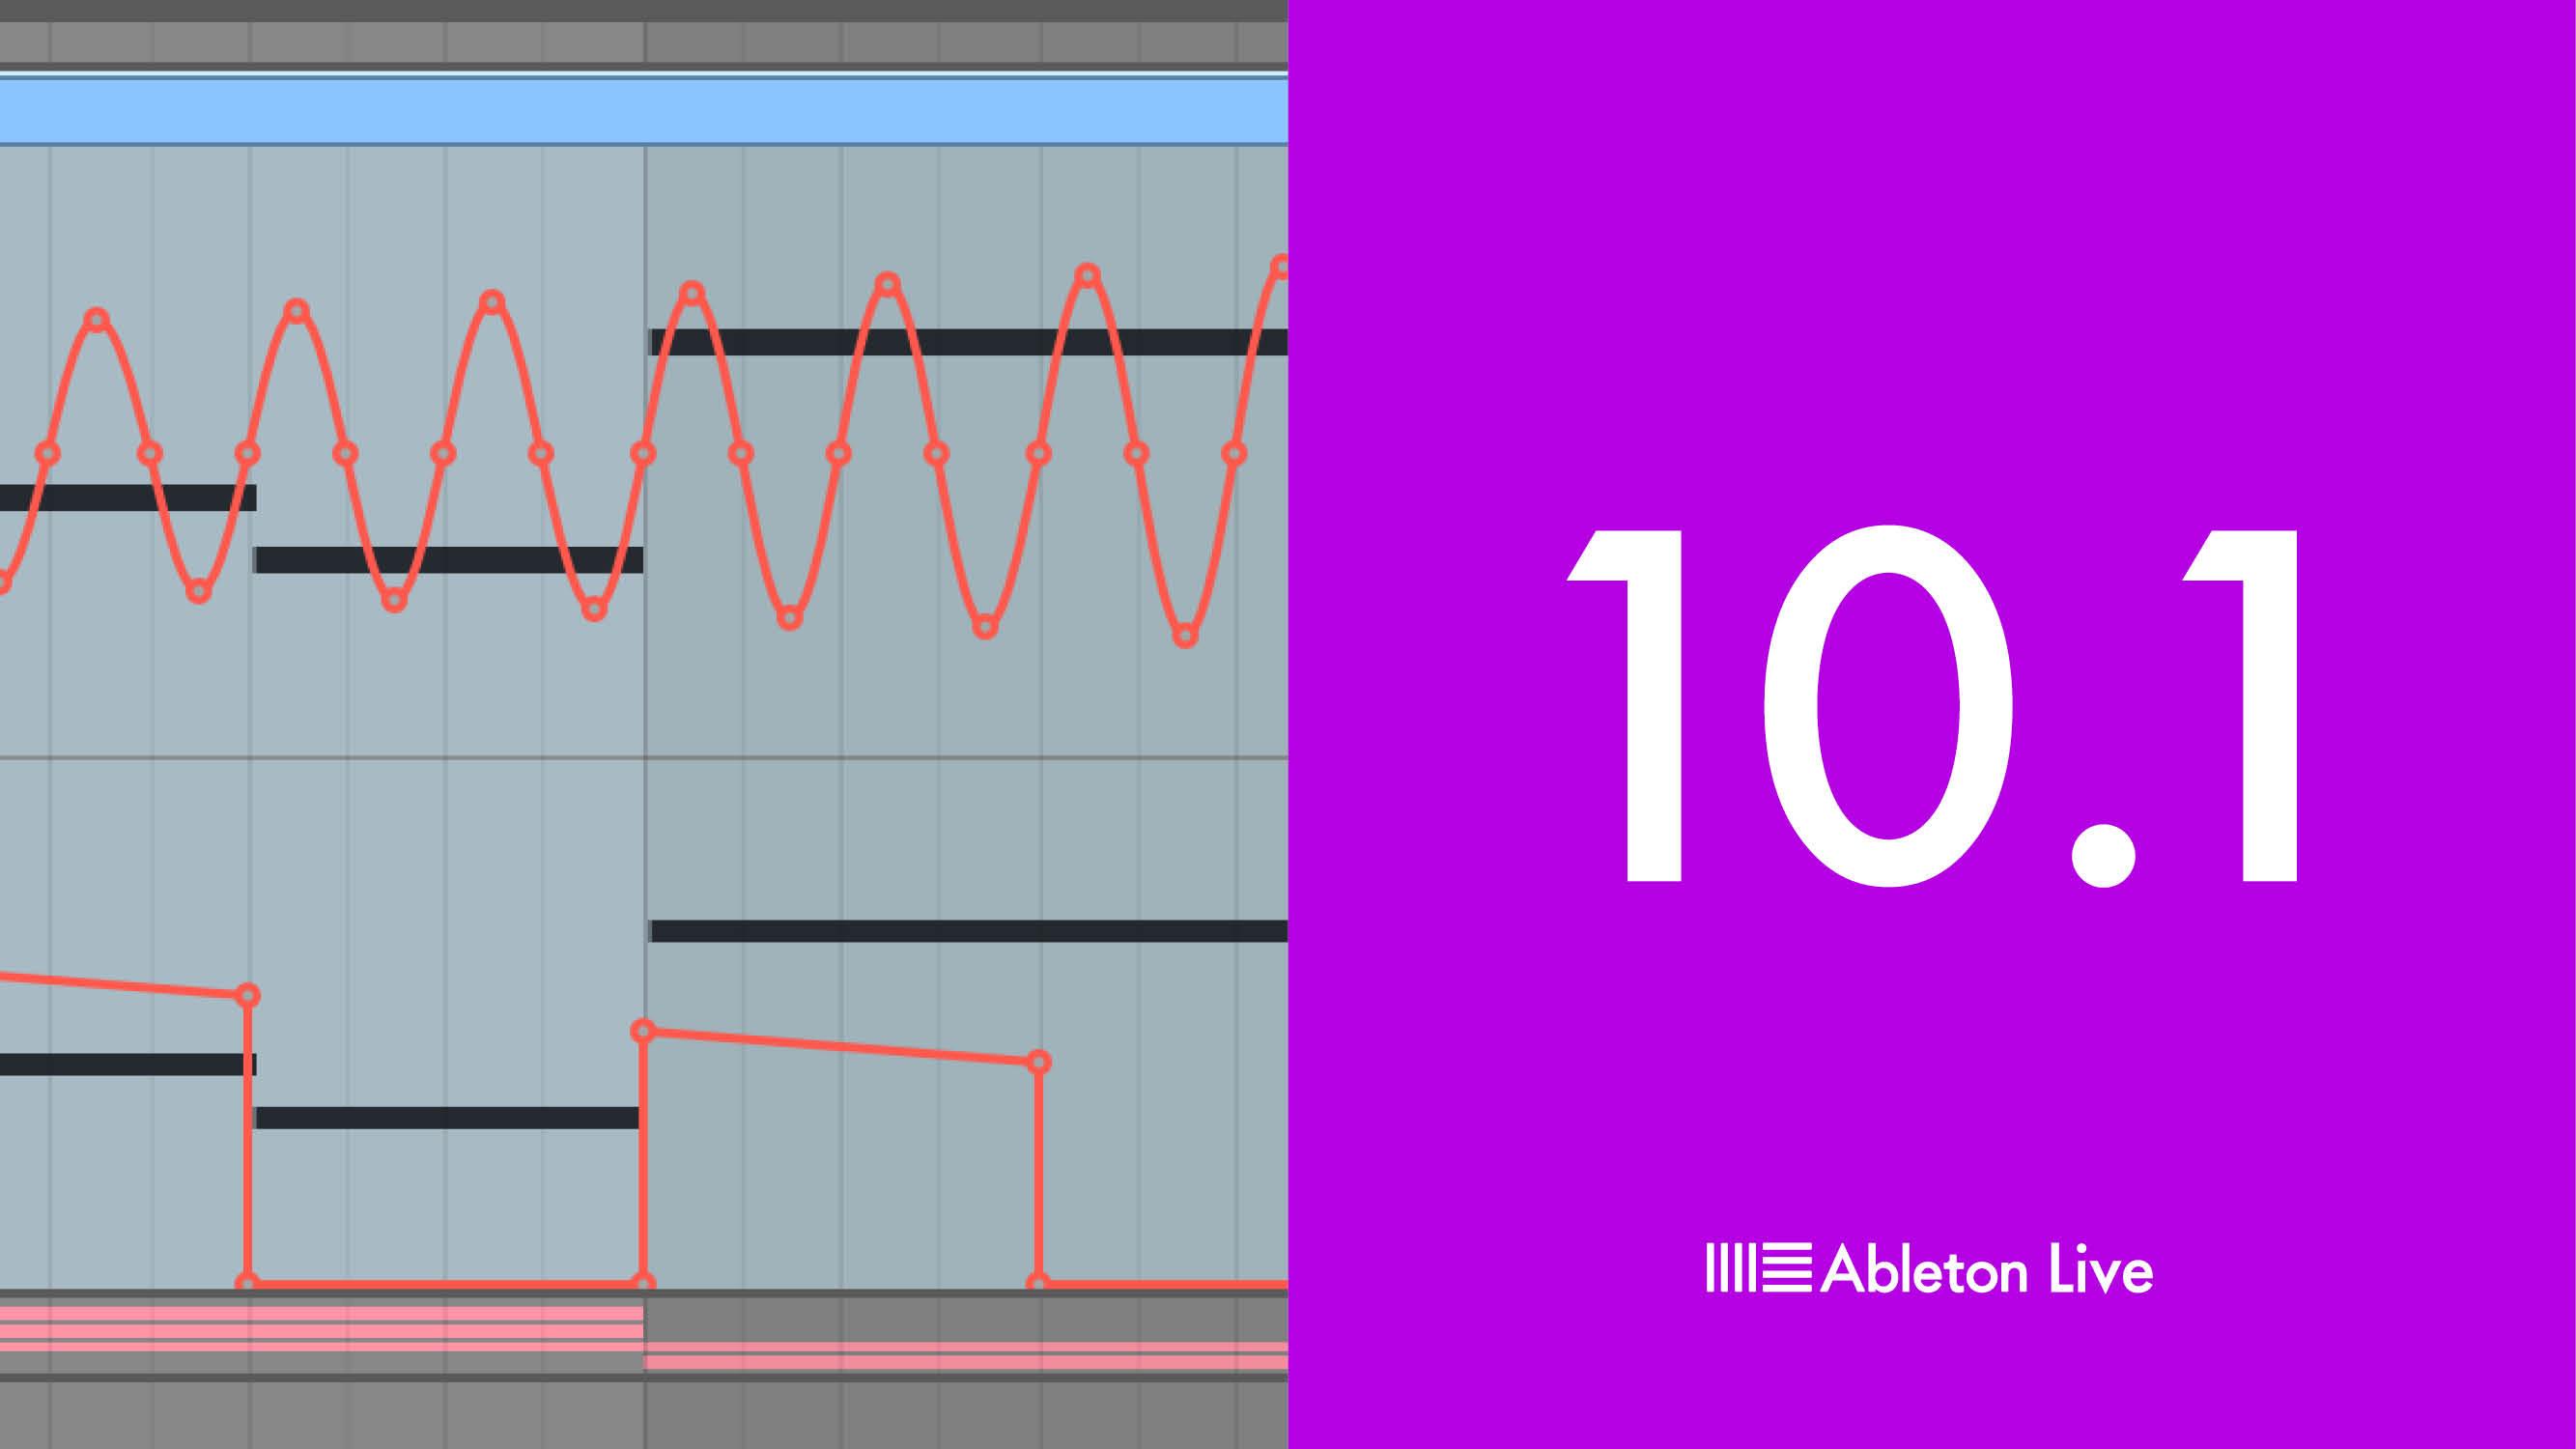 Ableton Liveが10.1へアップデート! Magenta Studio(音楽ディープラーニングプラグイン)へも対応済み